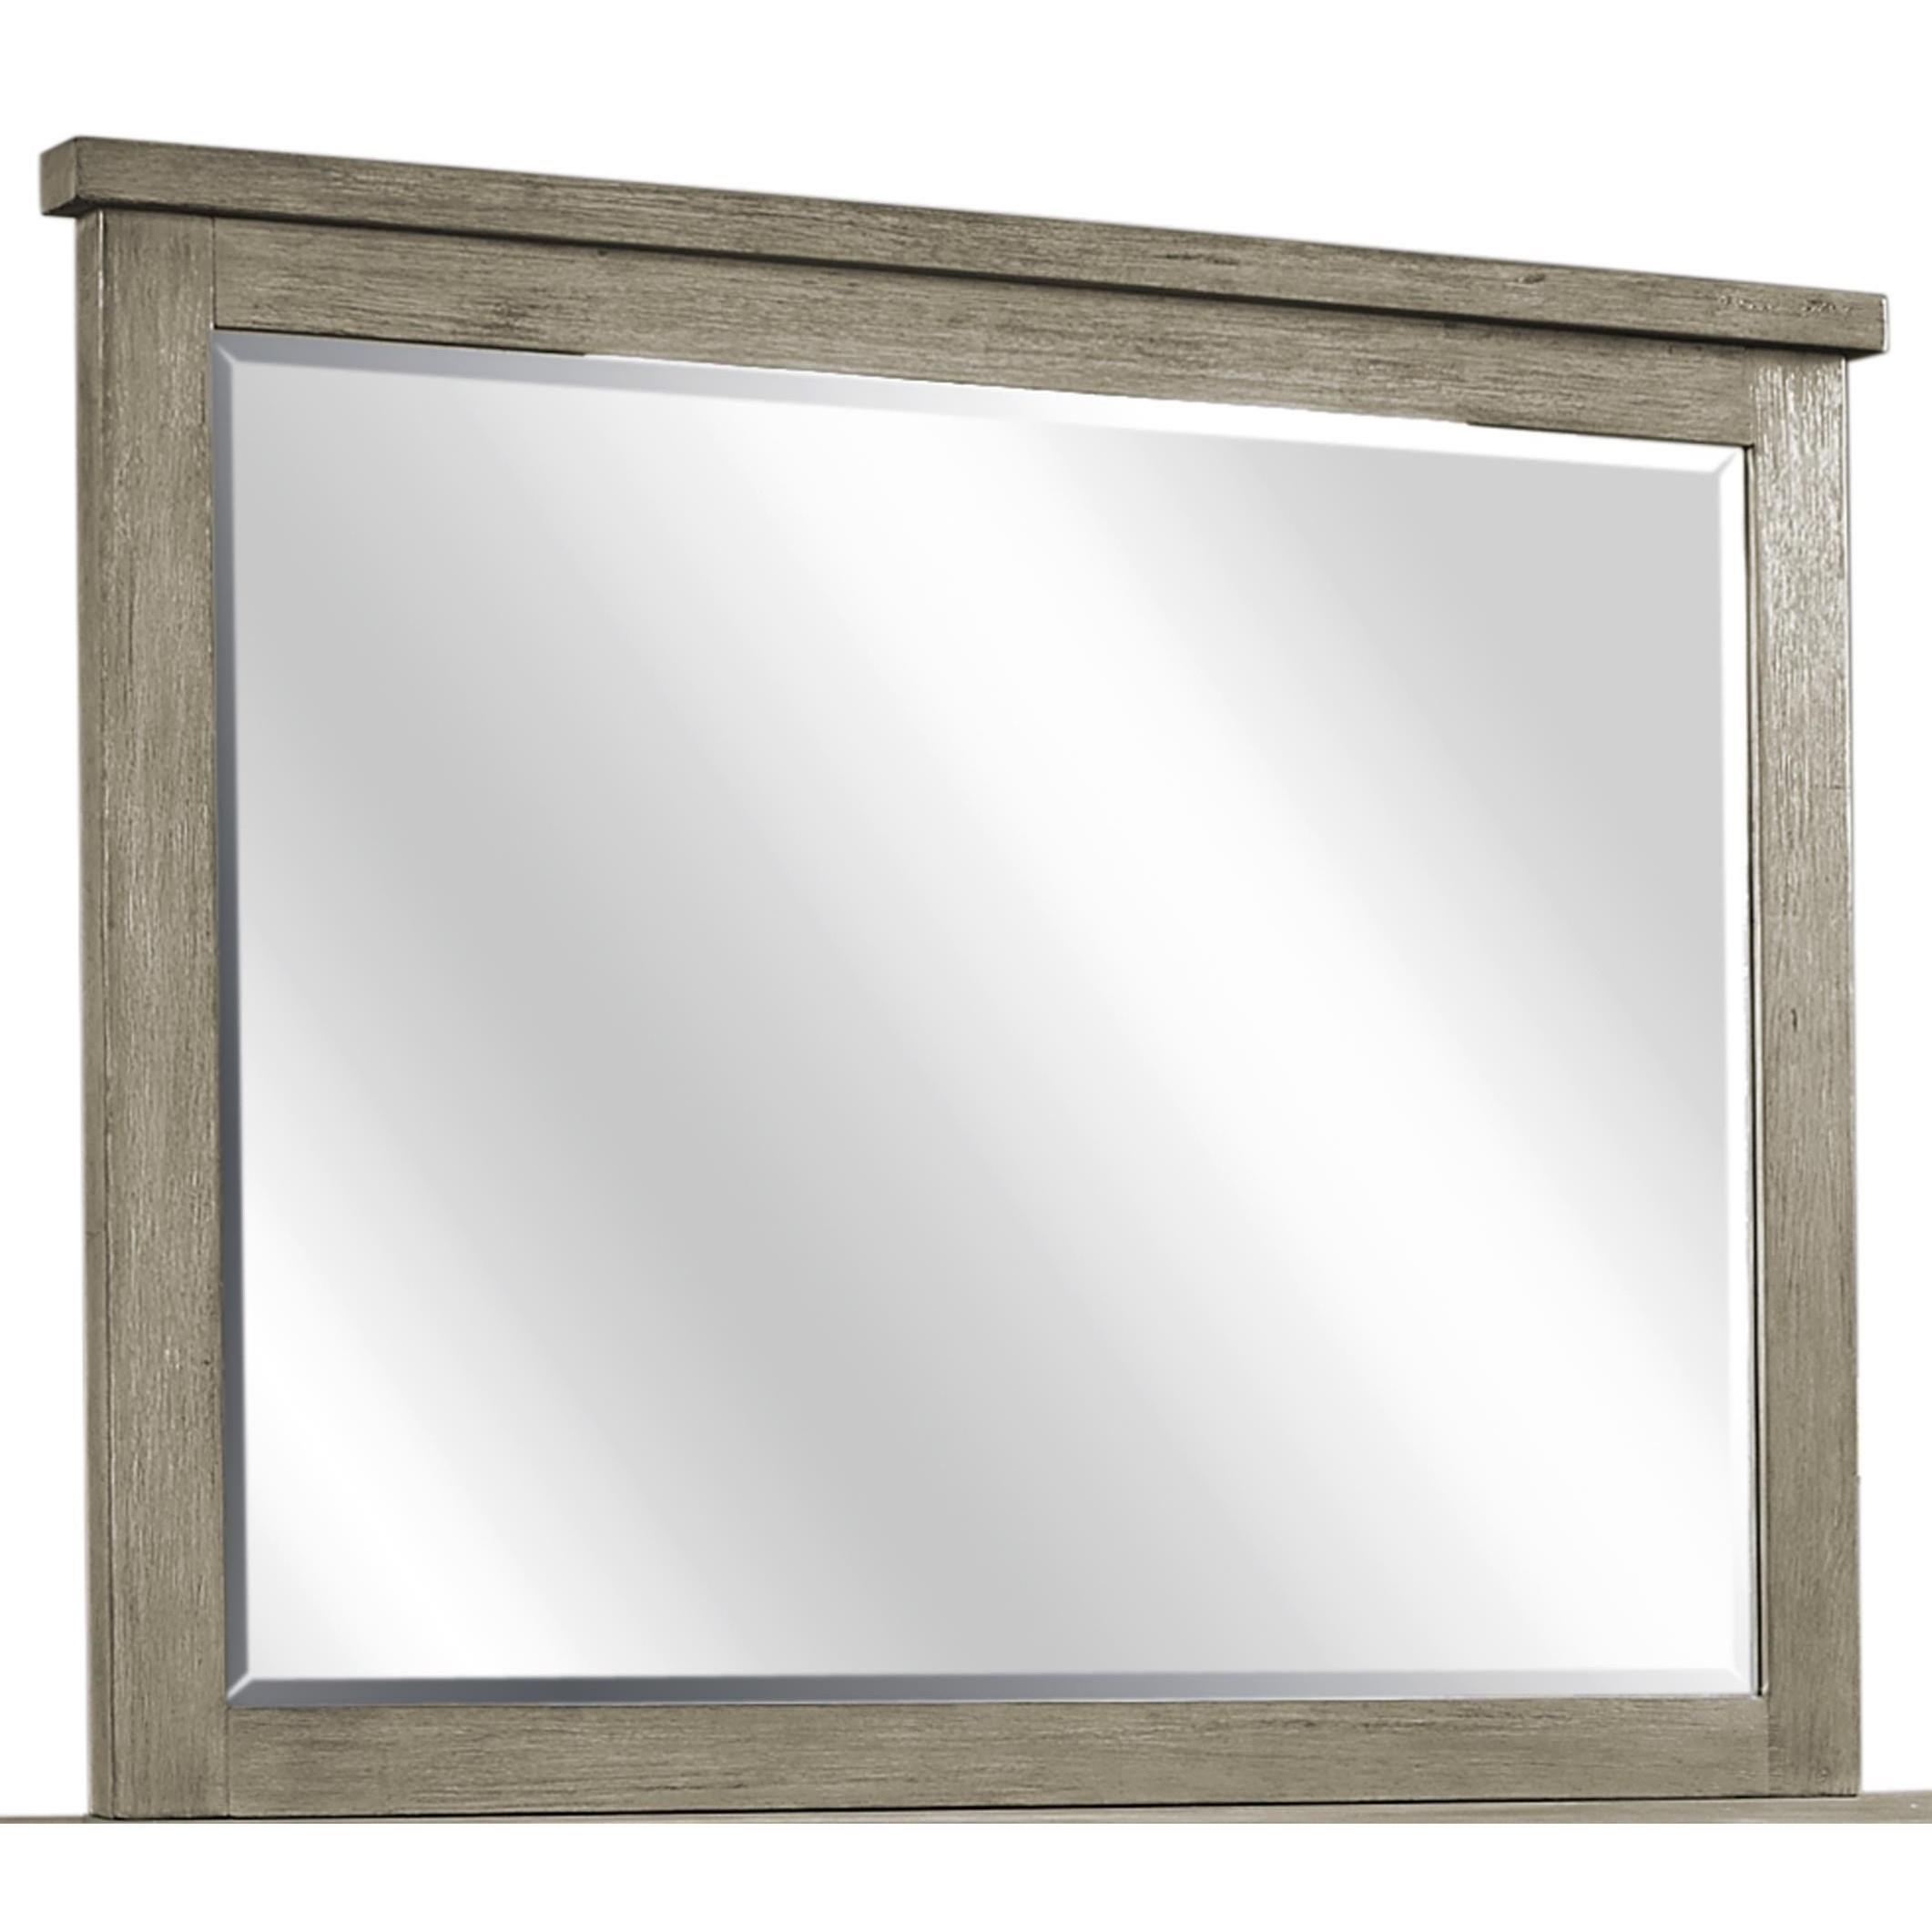 Tucker Landscape Mirror by Aspenhome at Walker's Furniture